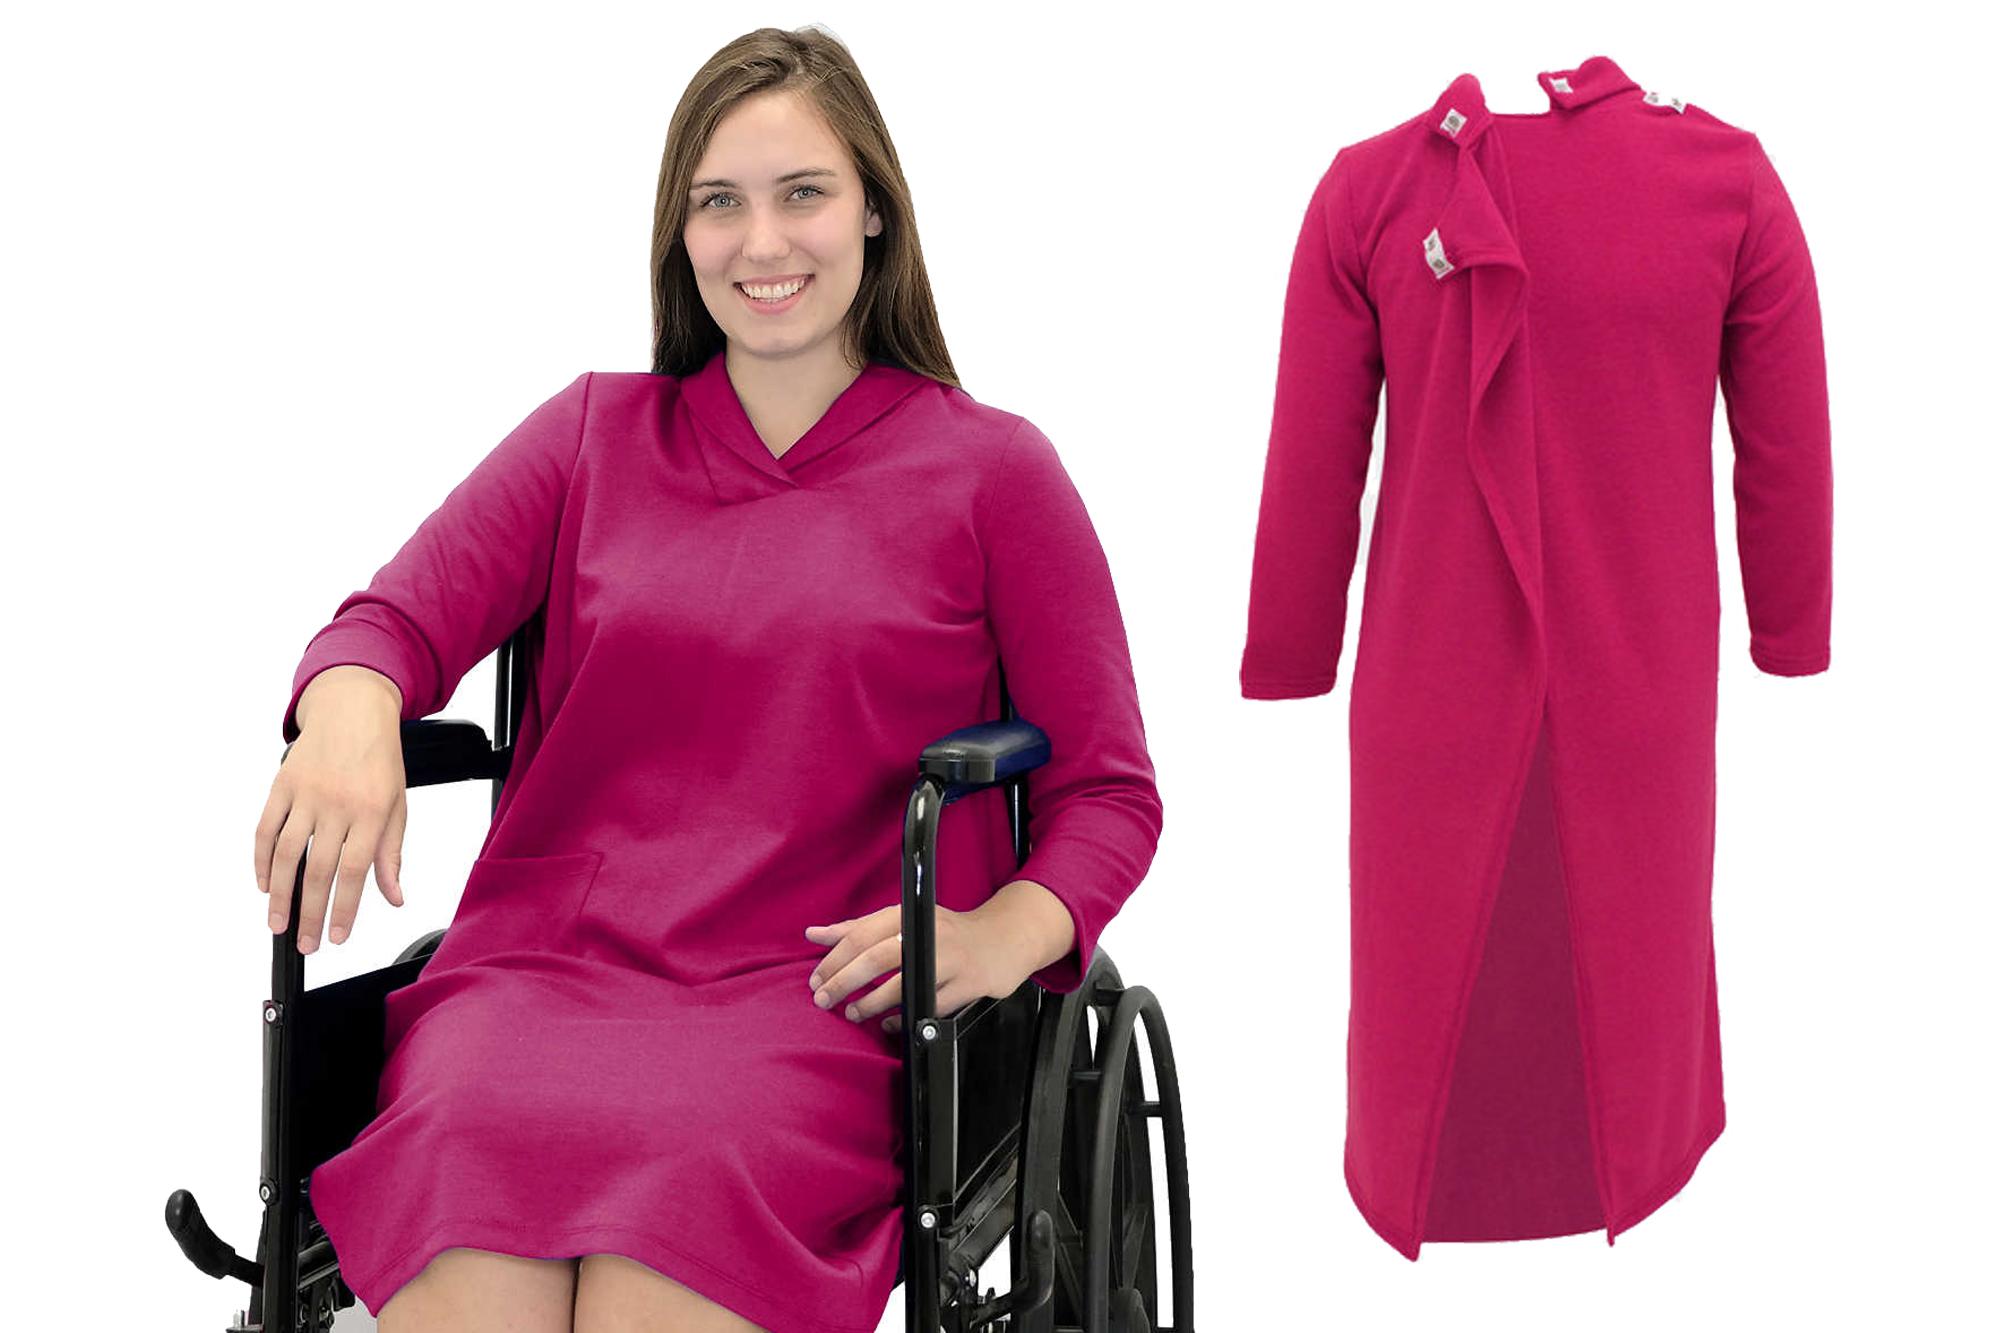 neu Lieblingskleid - Pflegemode Bilder